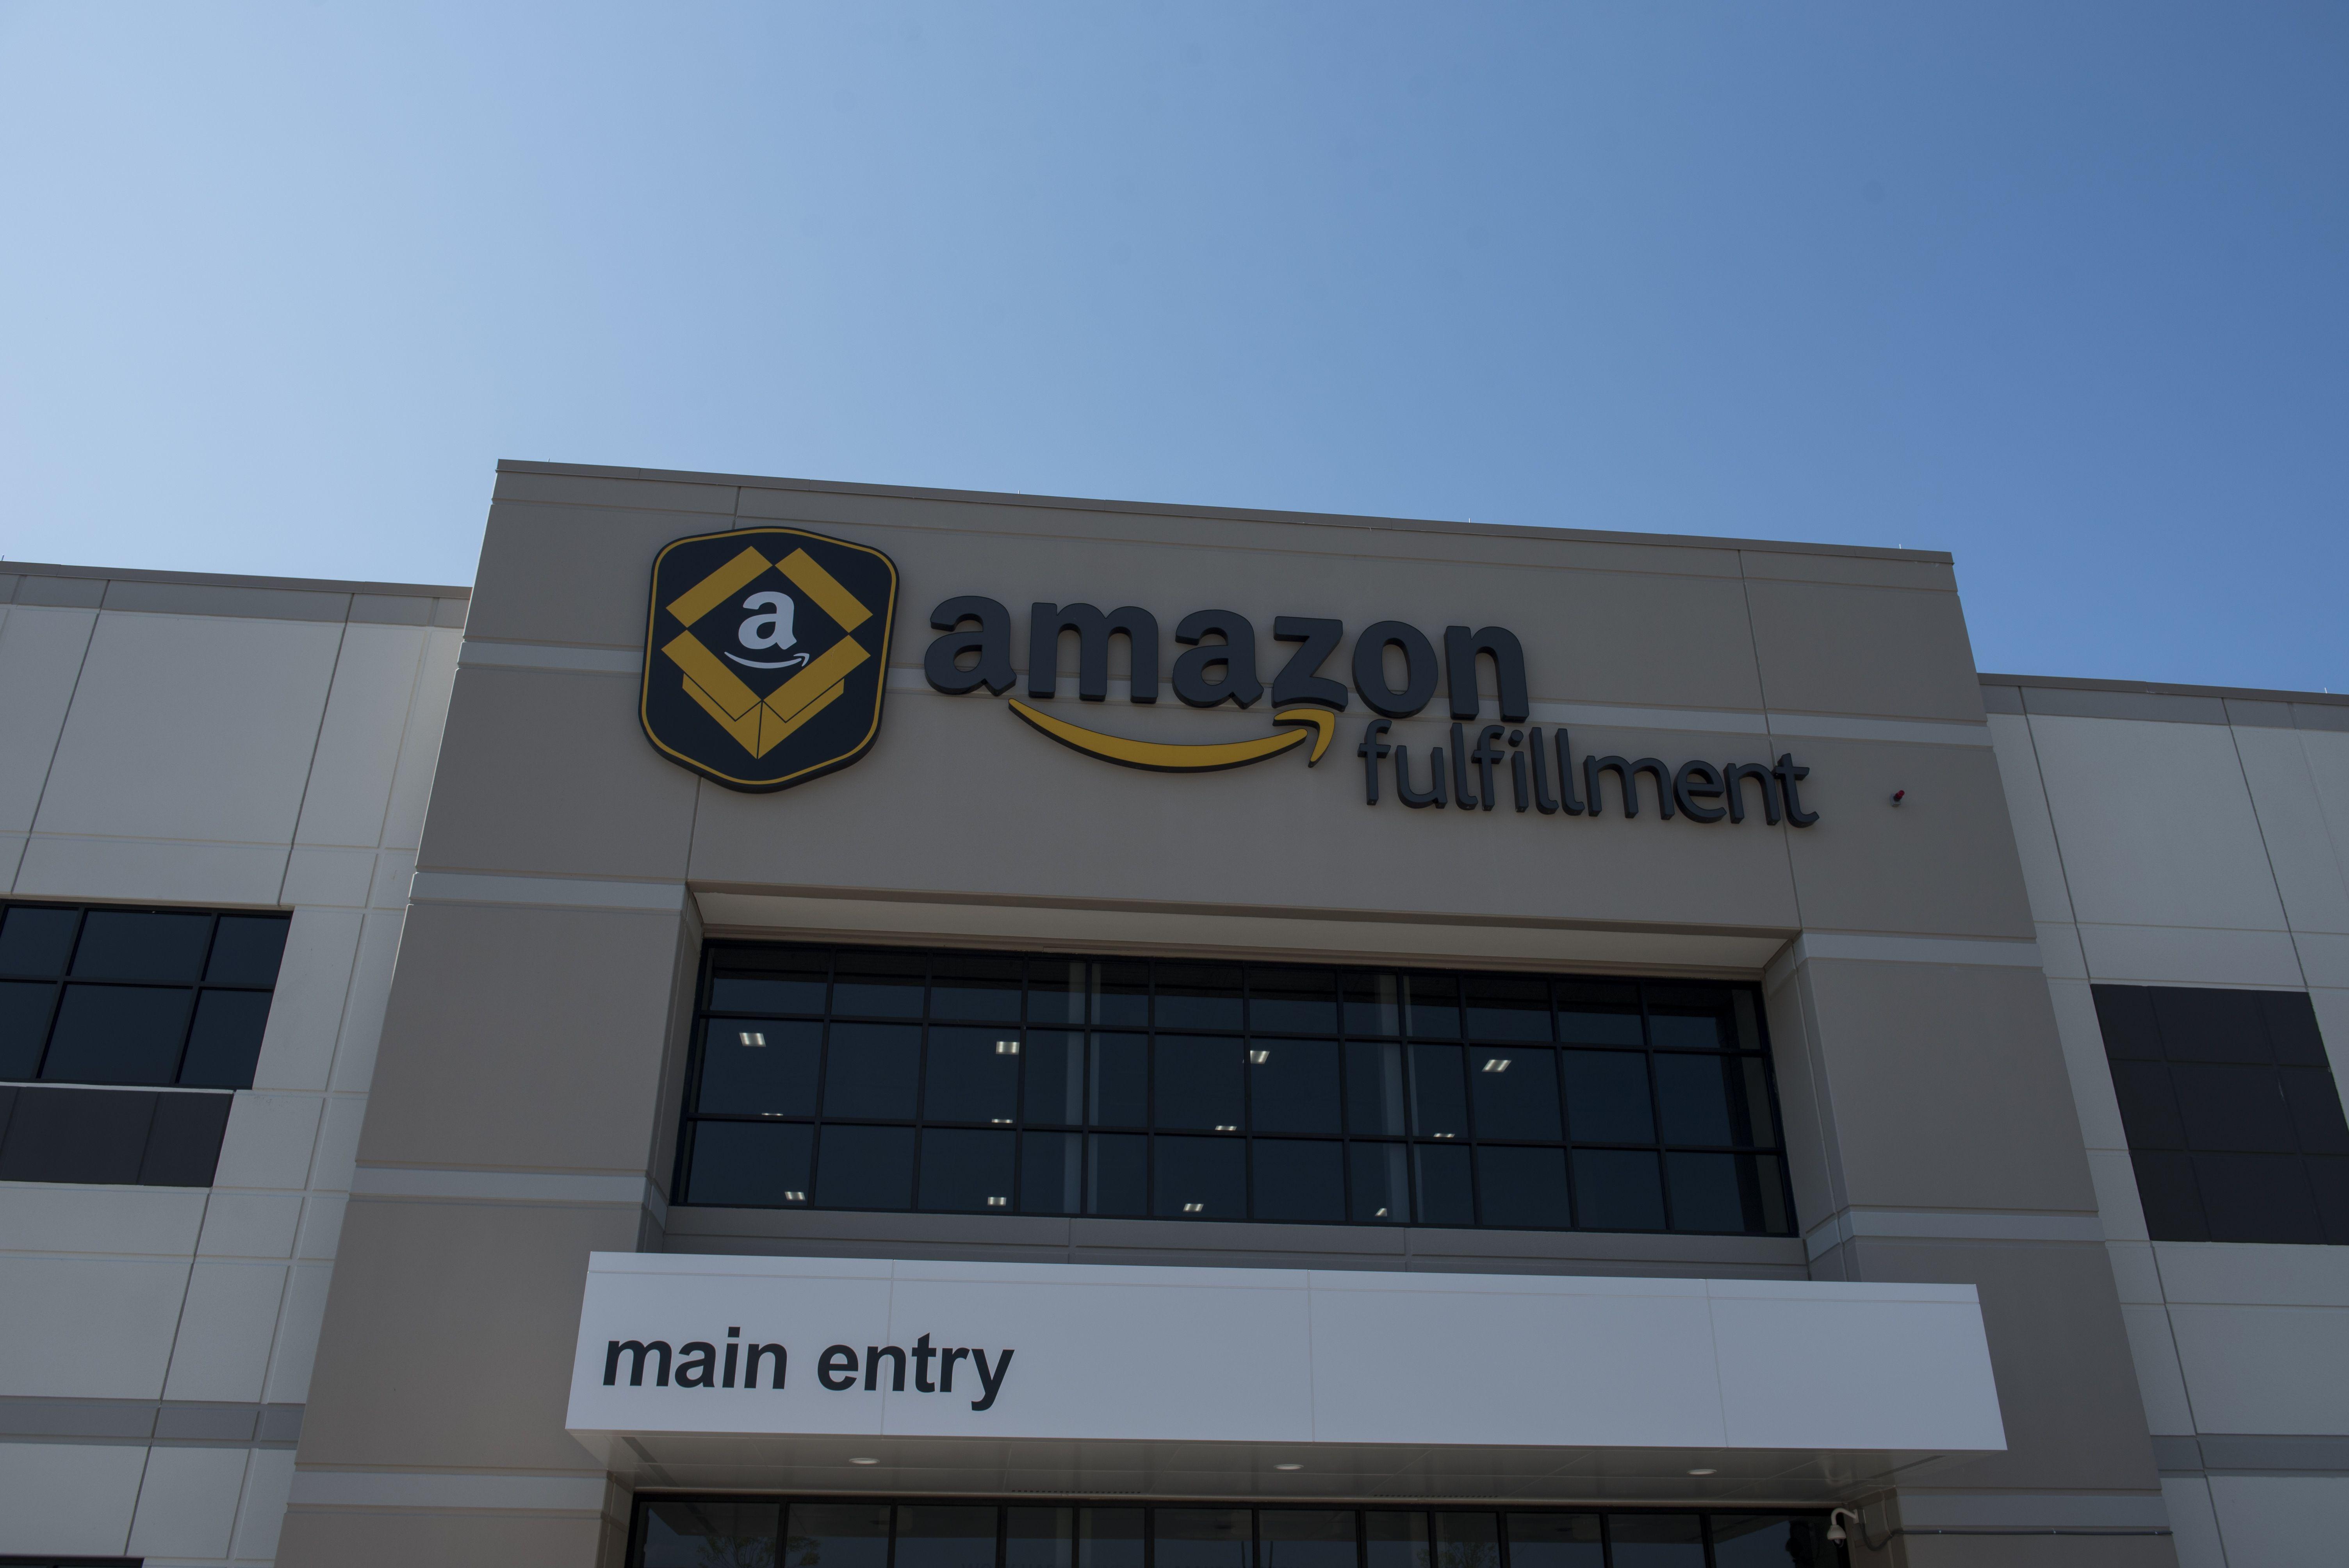 Amazon is rapidly adding warehouses in Massachusetts, sparking